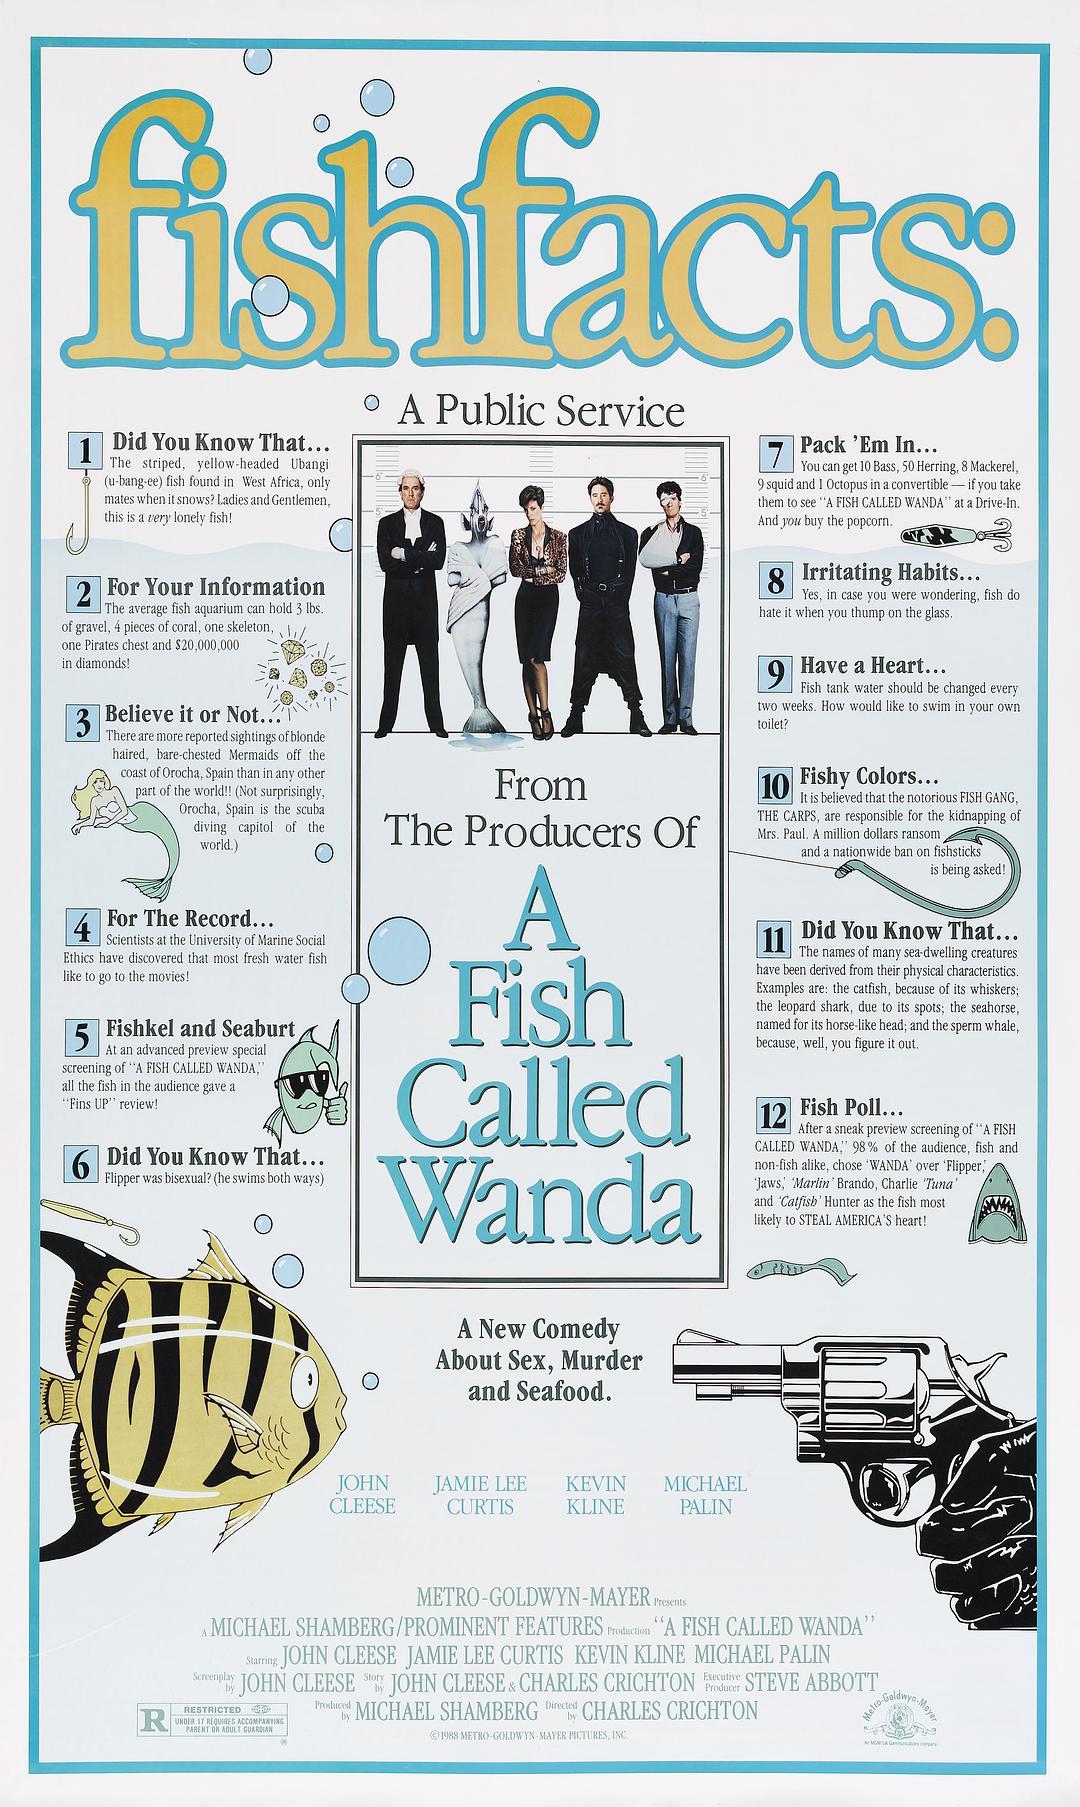 A Fish Called Wanda teaser